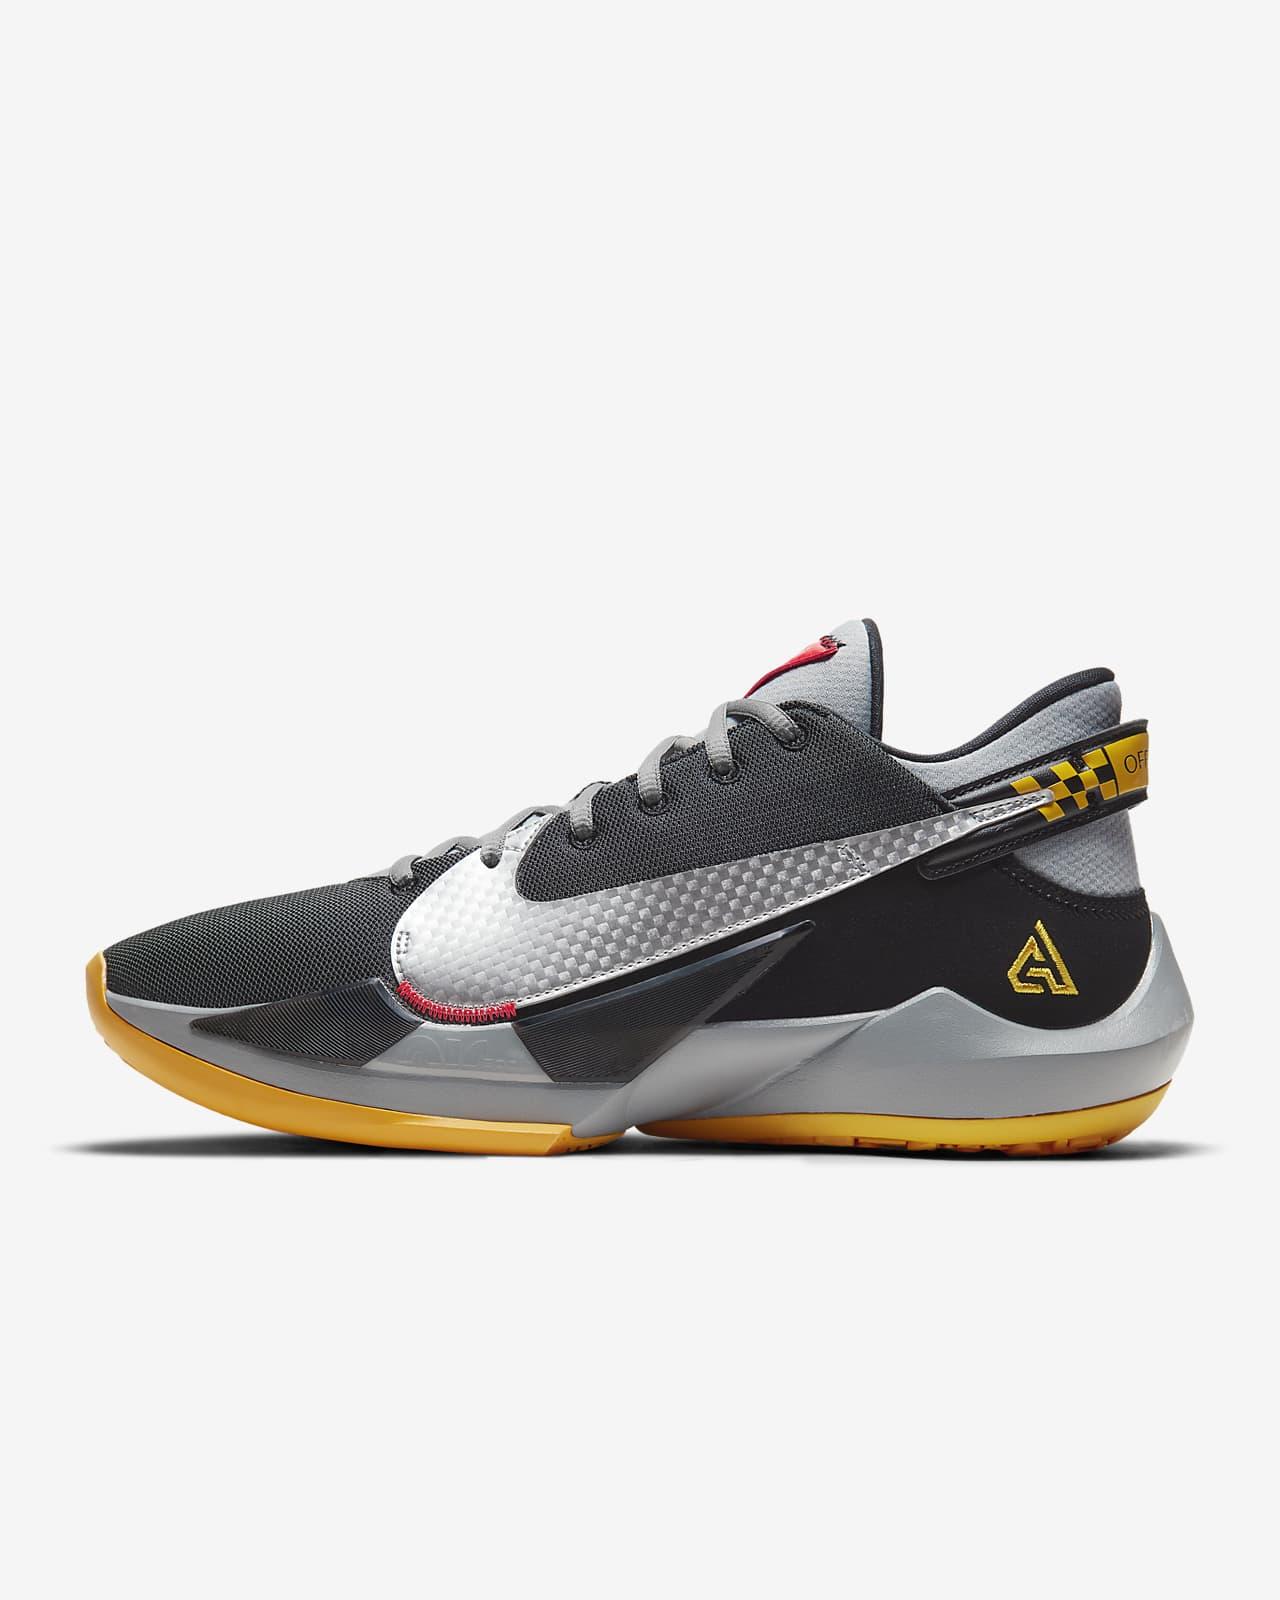 Zoom Freak 2 EP 男子篮球鞋